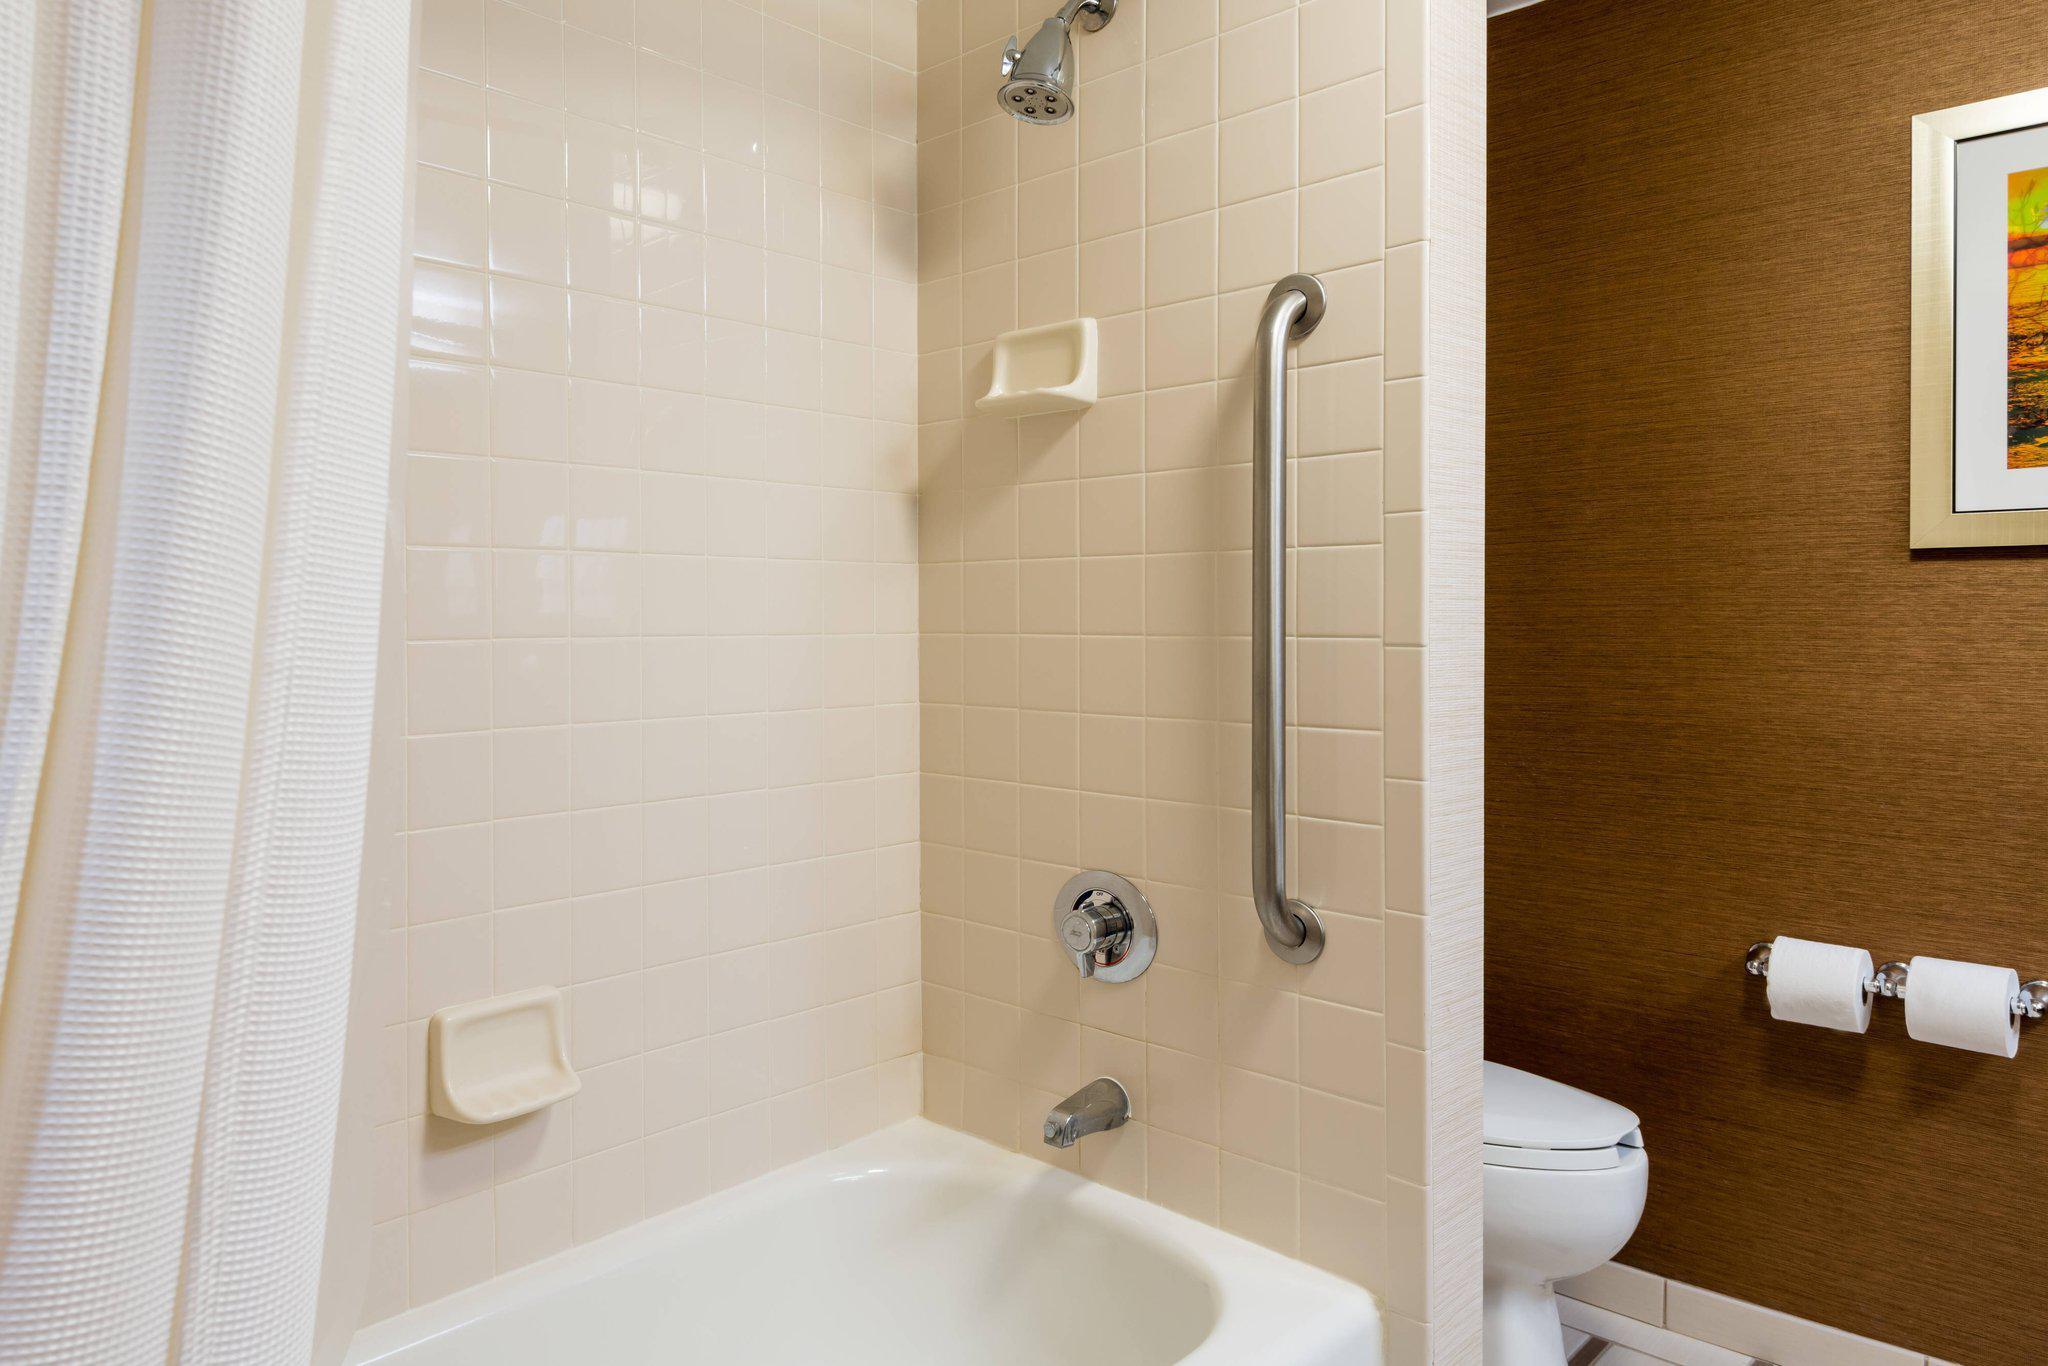 Fairfield Inn & Suites by Marriott Clearwater in Clearwater, FL, photo #11